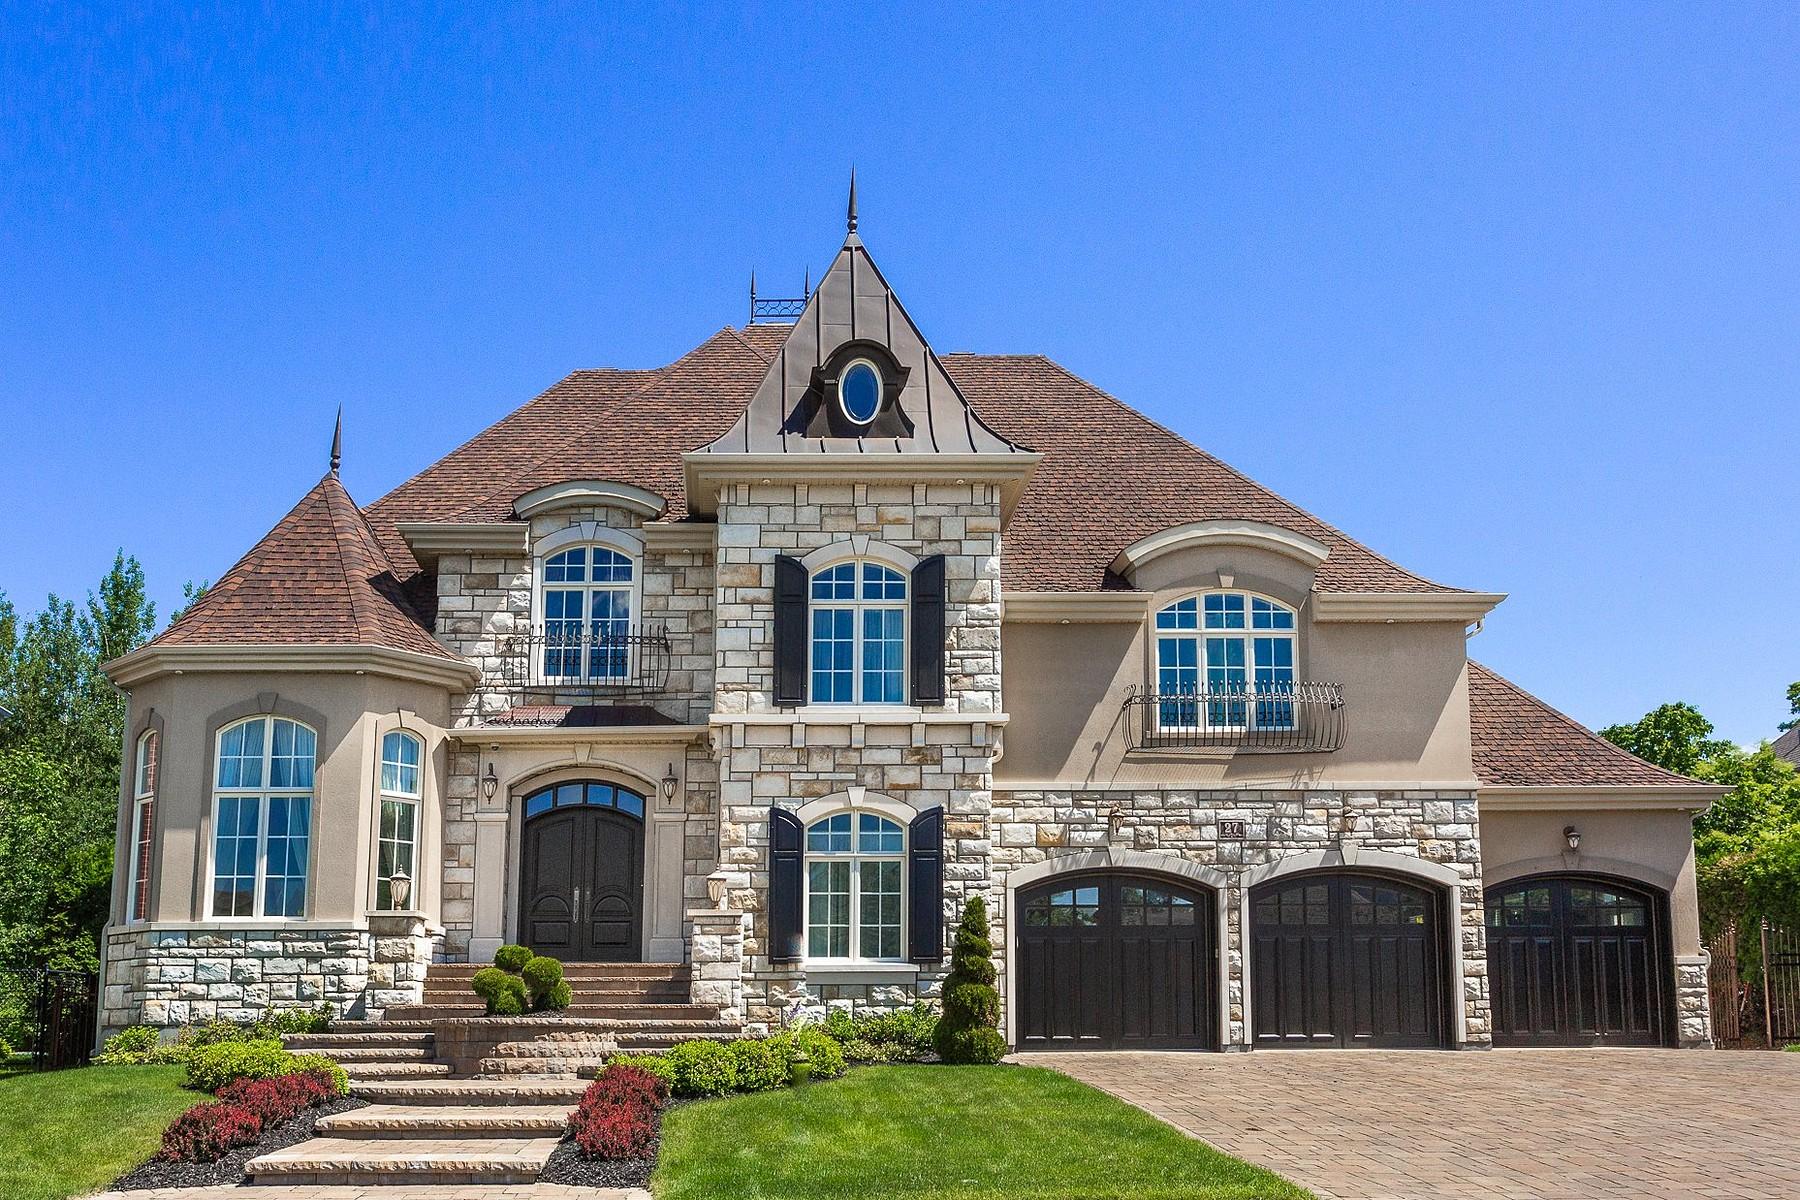 Single Family Homes for Sale at Candiac, Montérégie 27 Rue Duberger Candiac, Quebec J5R6N1 Canada